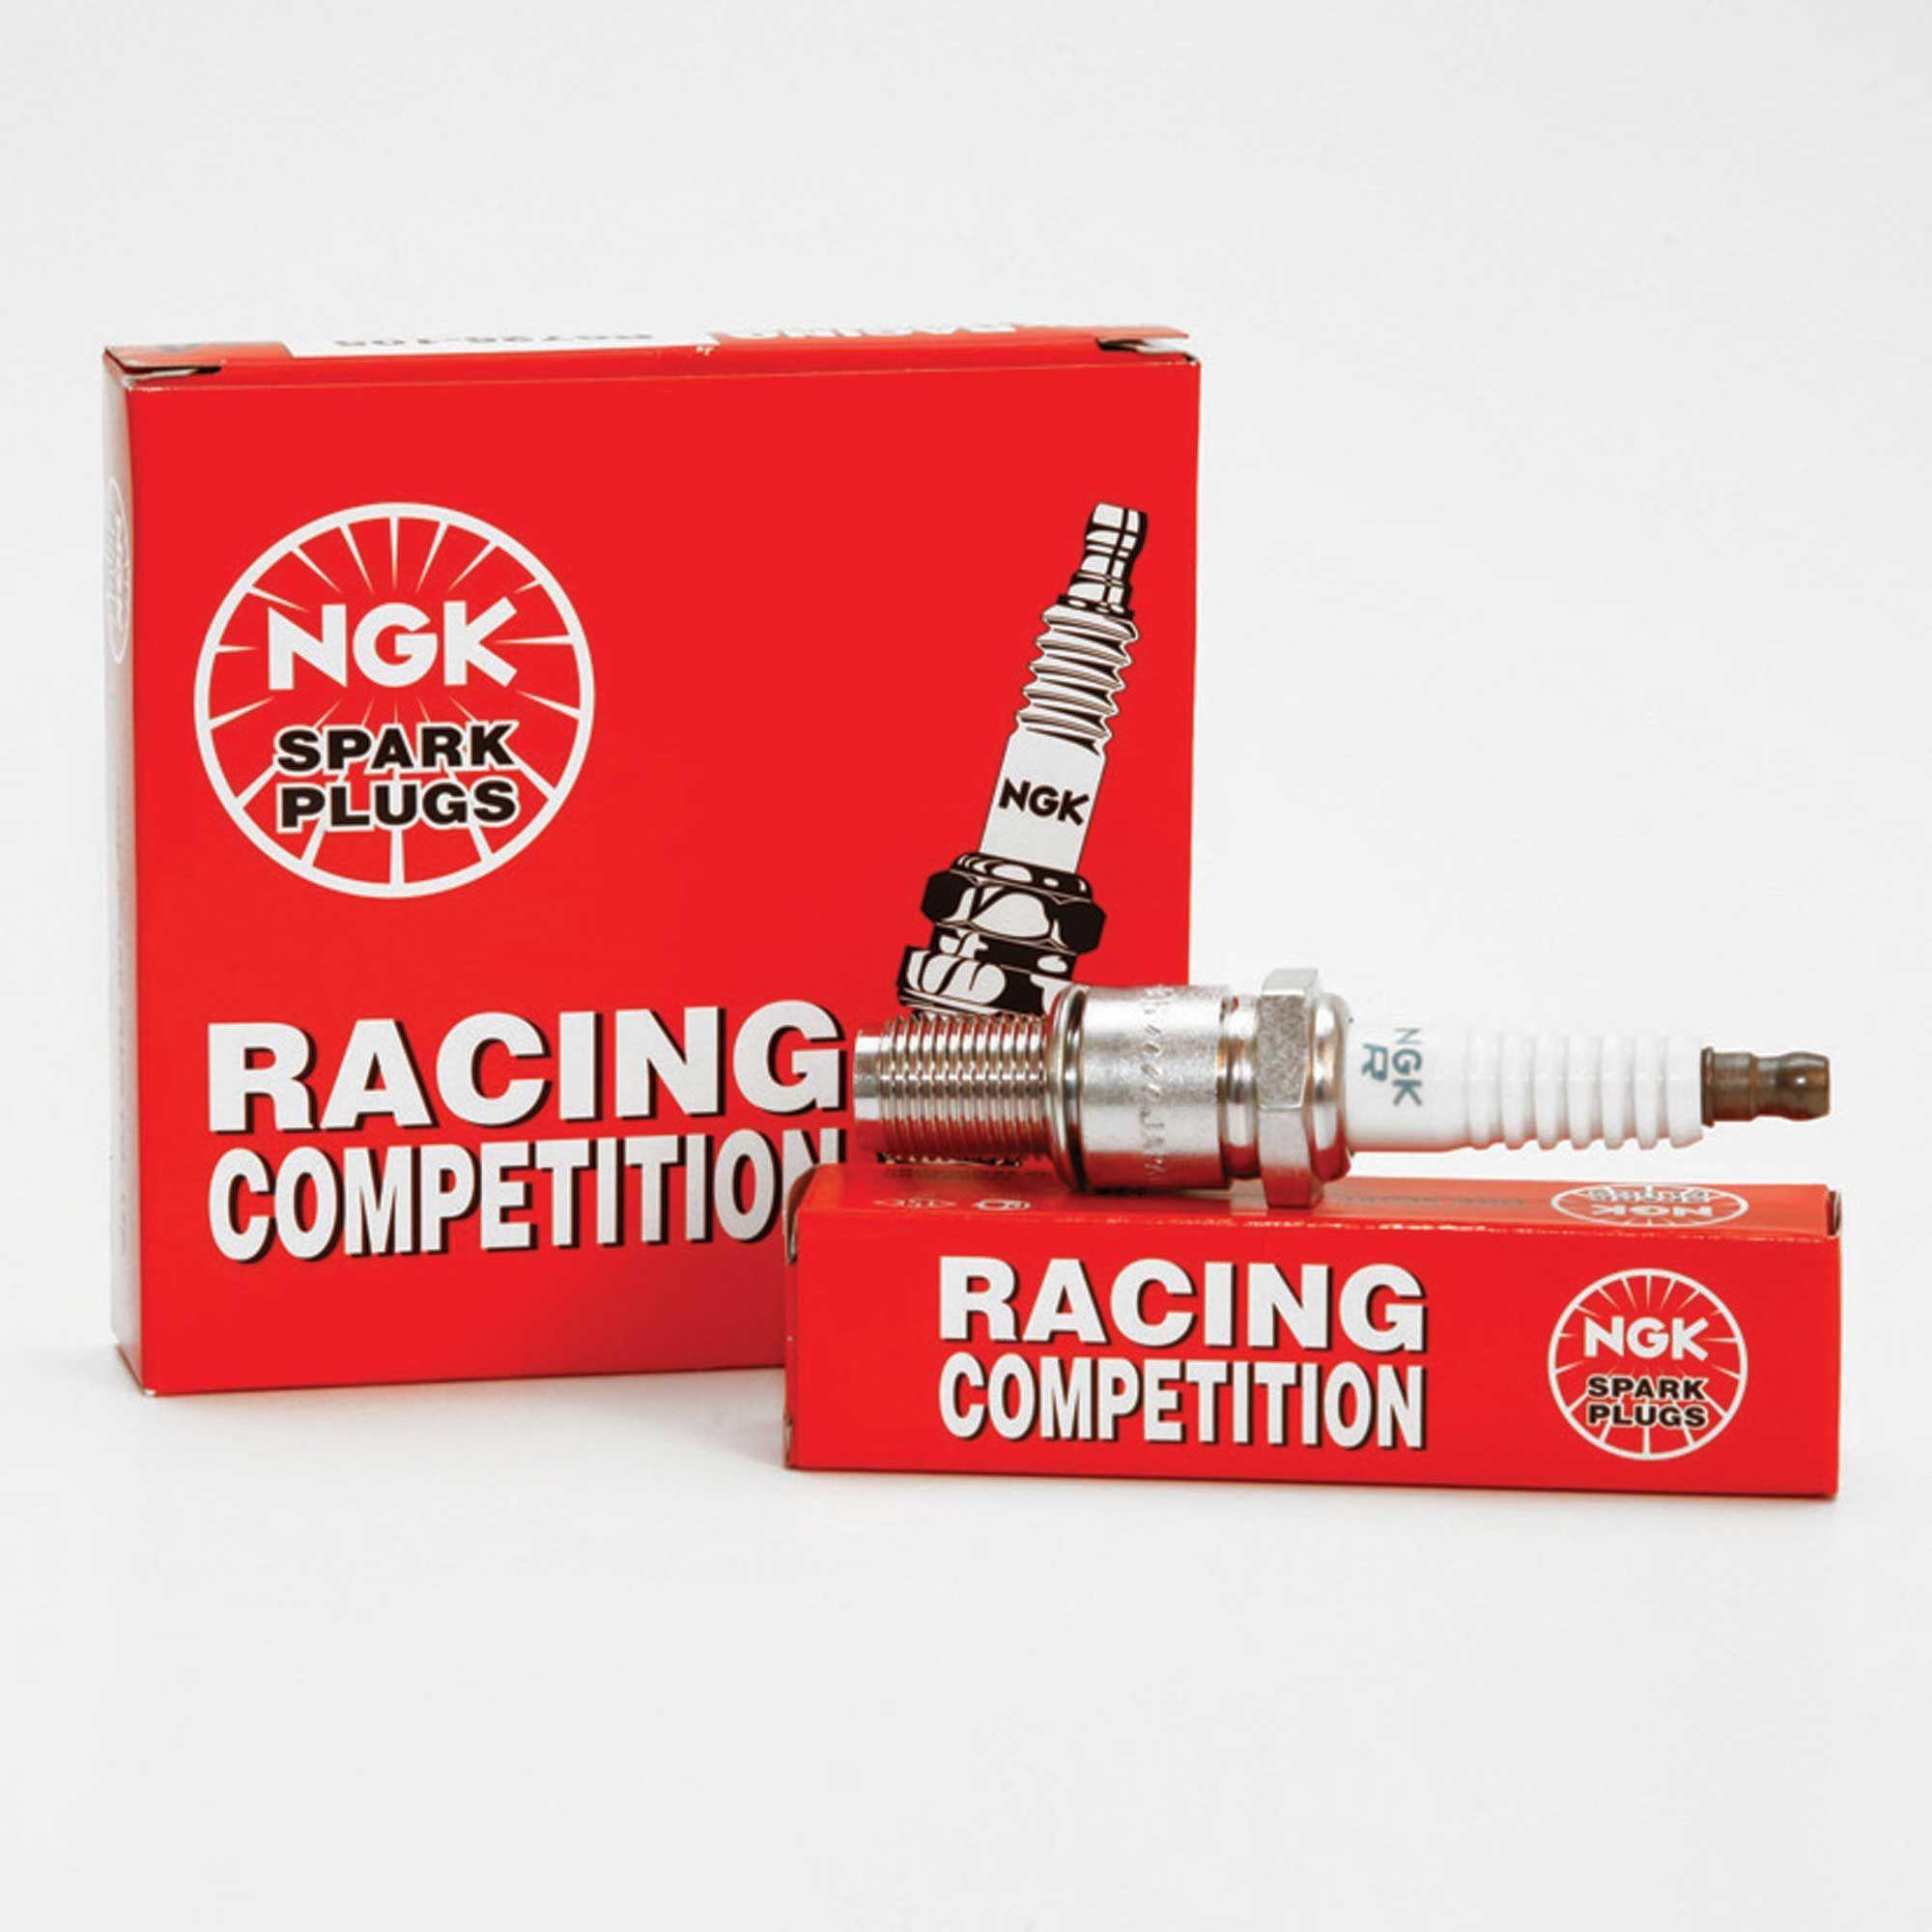 NGK Racing Competition Spark Plug